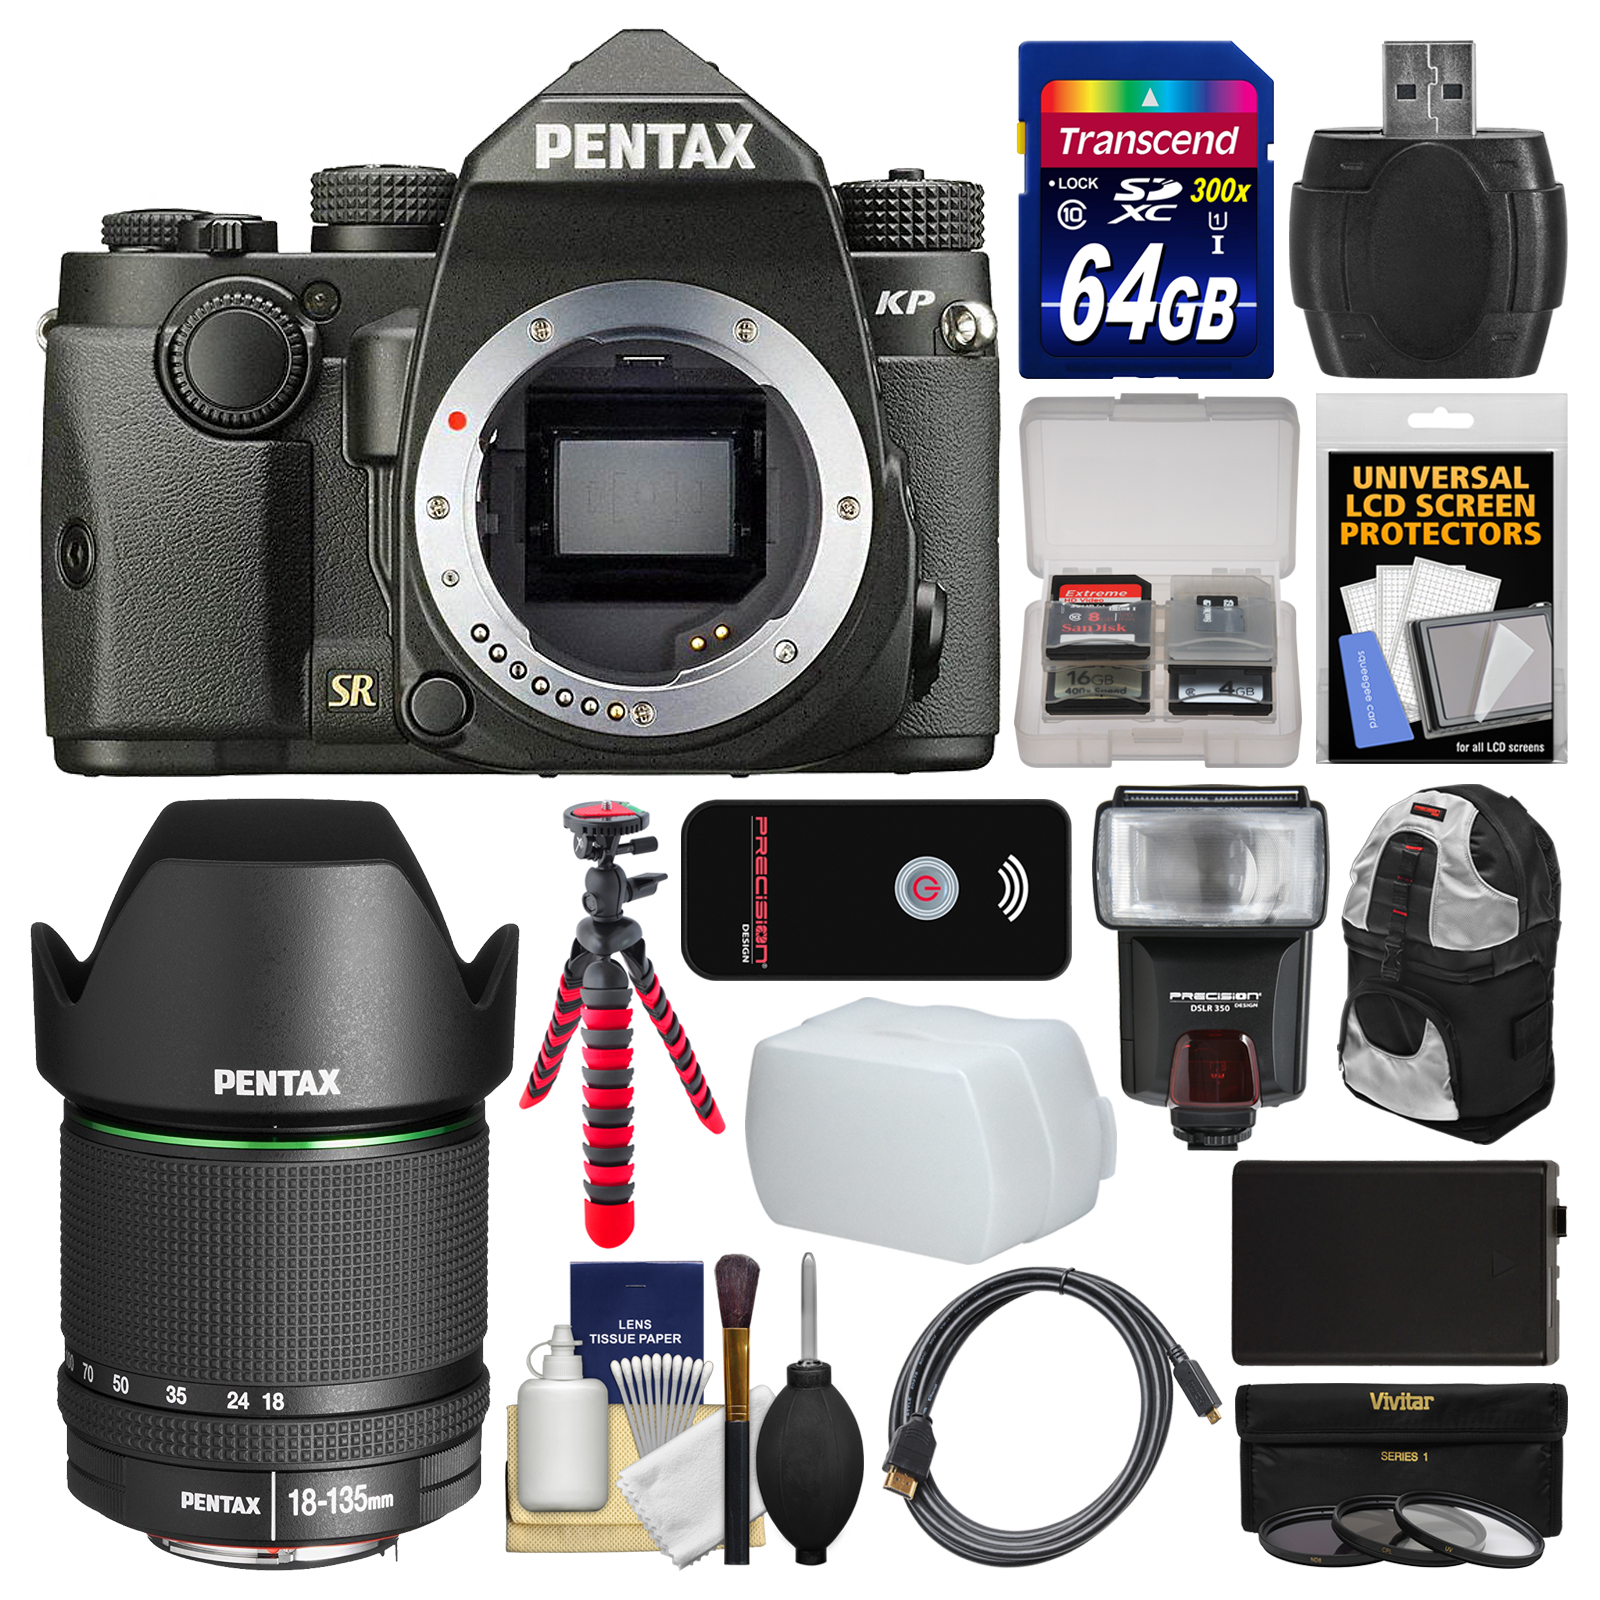 Pentax KP Wi-Fi Digital SLR Camera Body (Black) with 18-135mm Lens + 64GB Card + Backpack + Flash + Battery +... by Pentax